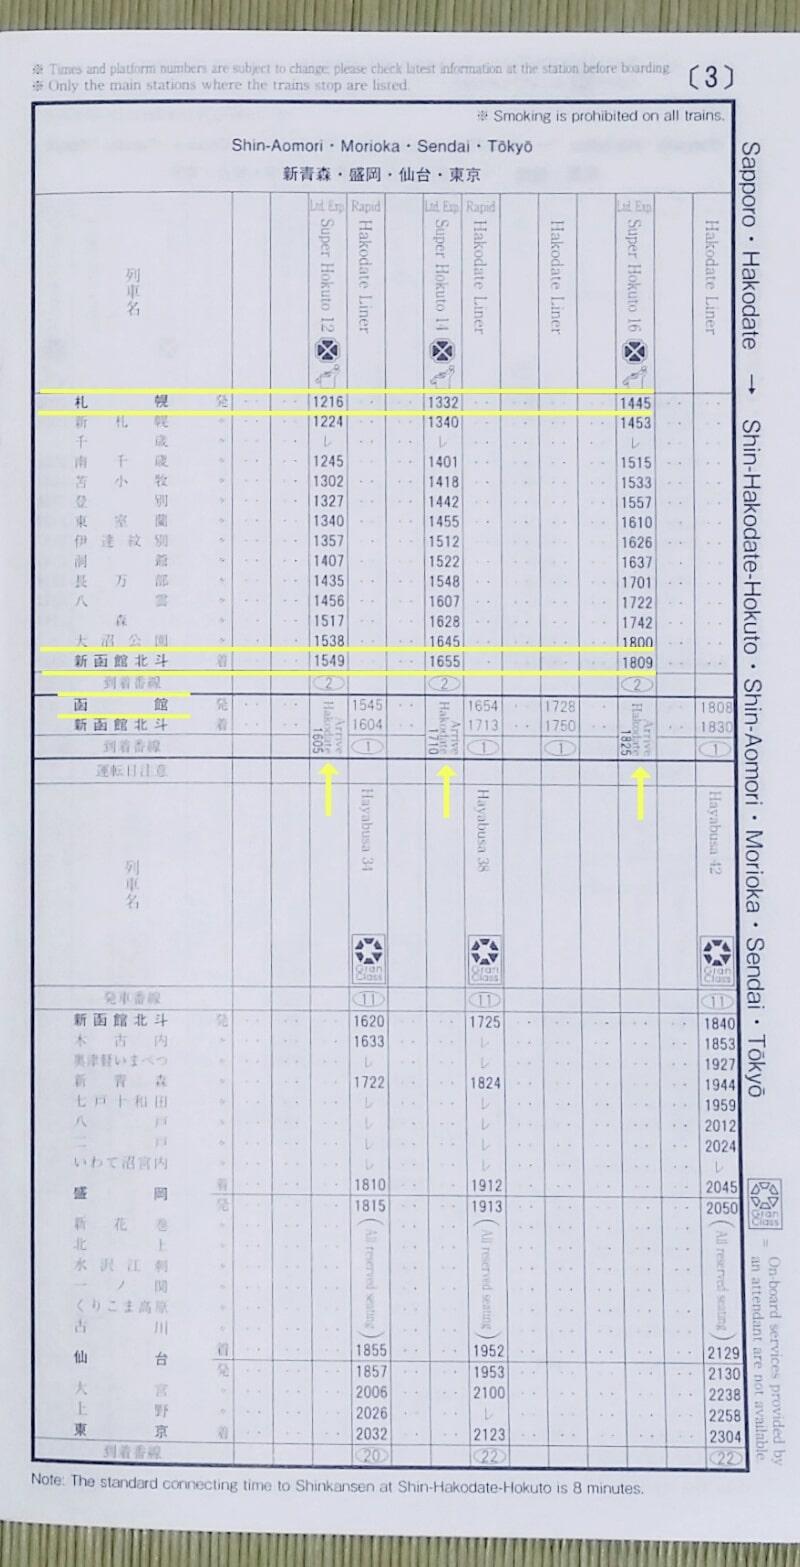 Sapporo to Hakodate train - JR Hokkaido train timetable timings afternoon train. Backpacking Hokkaido Japan